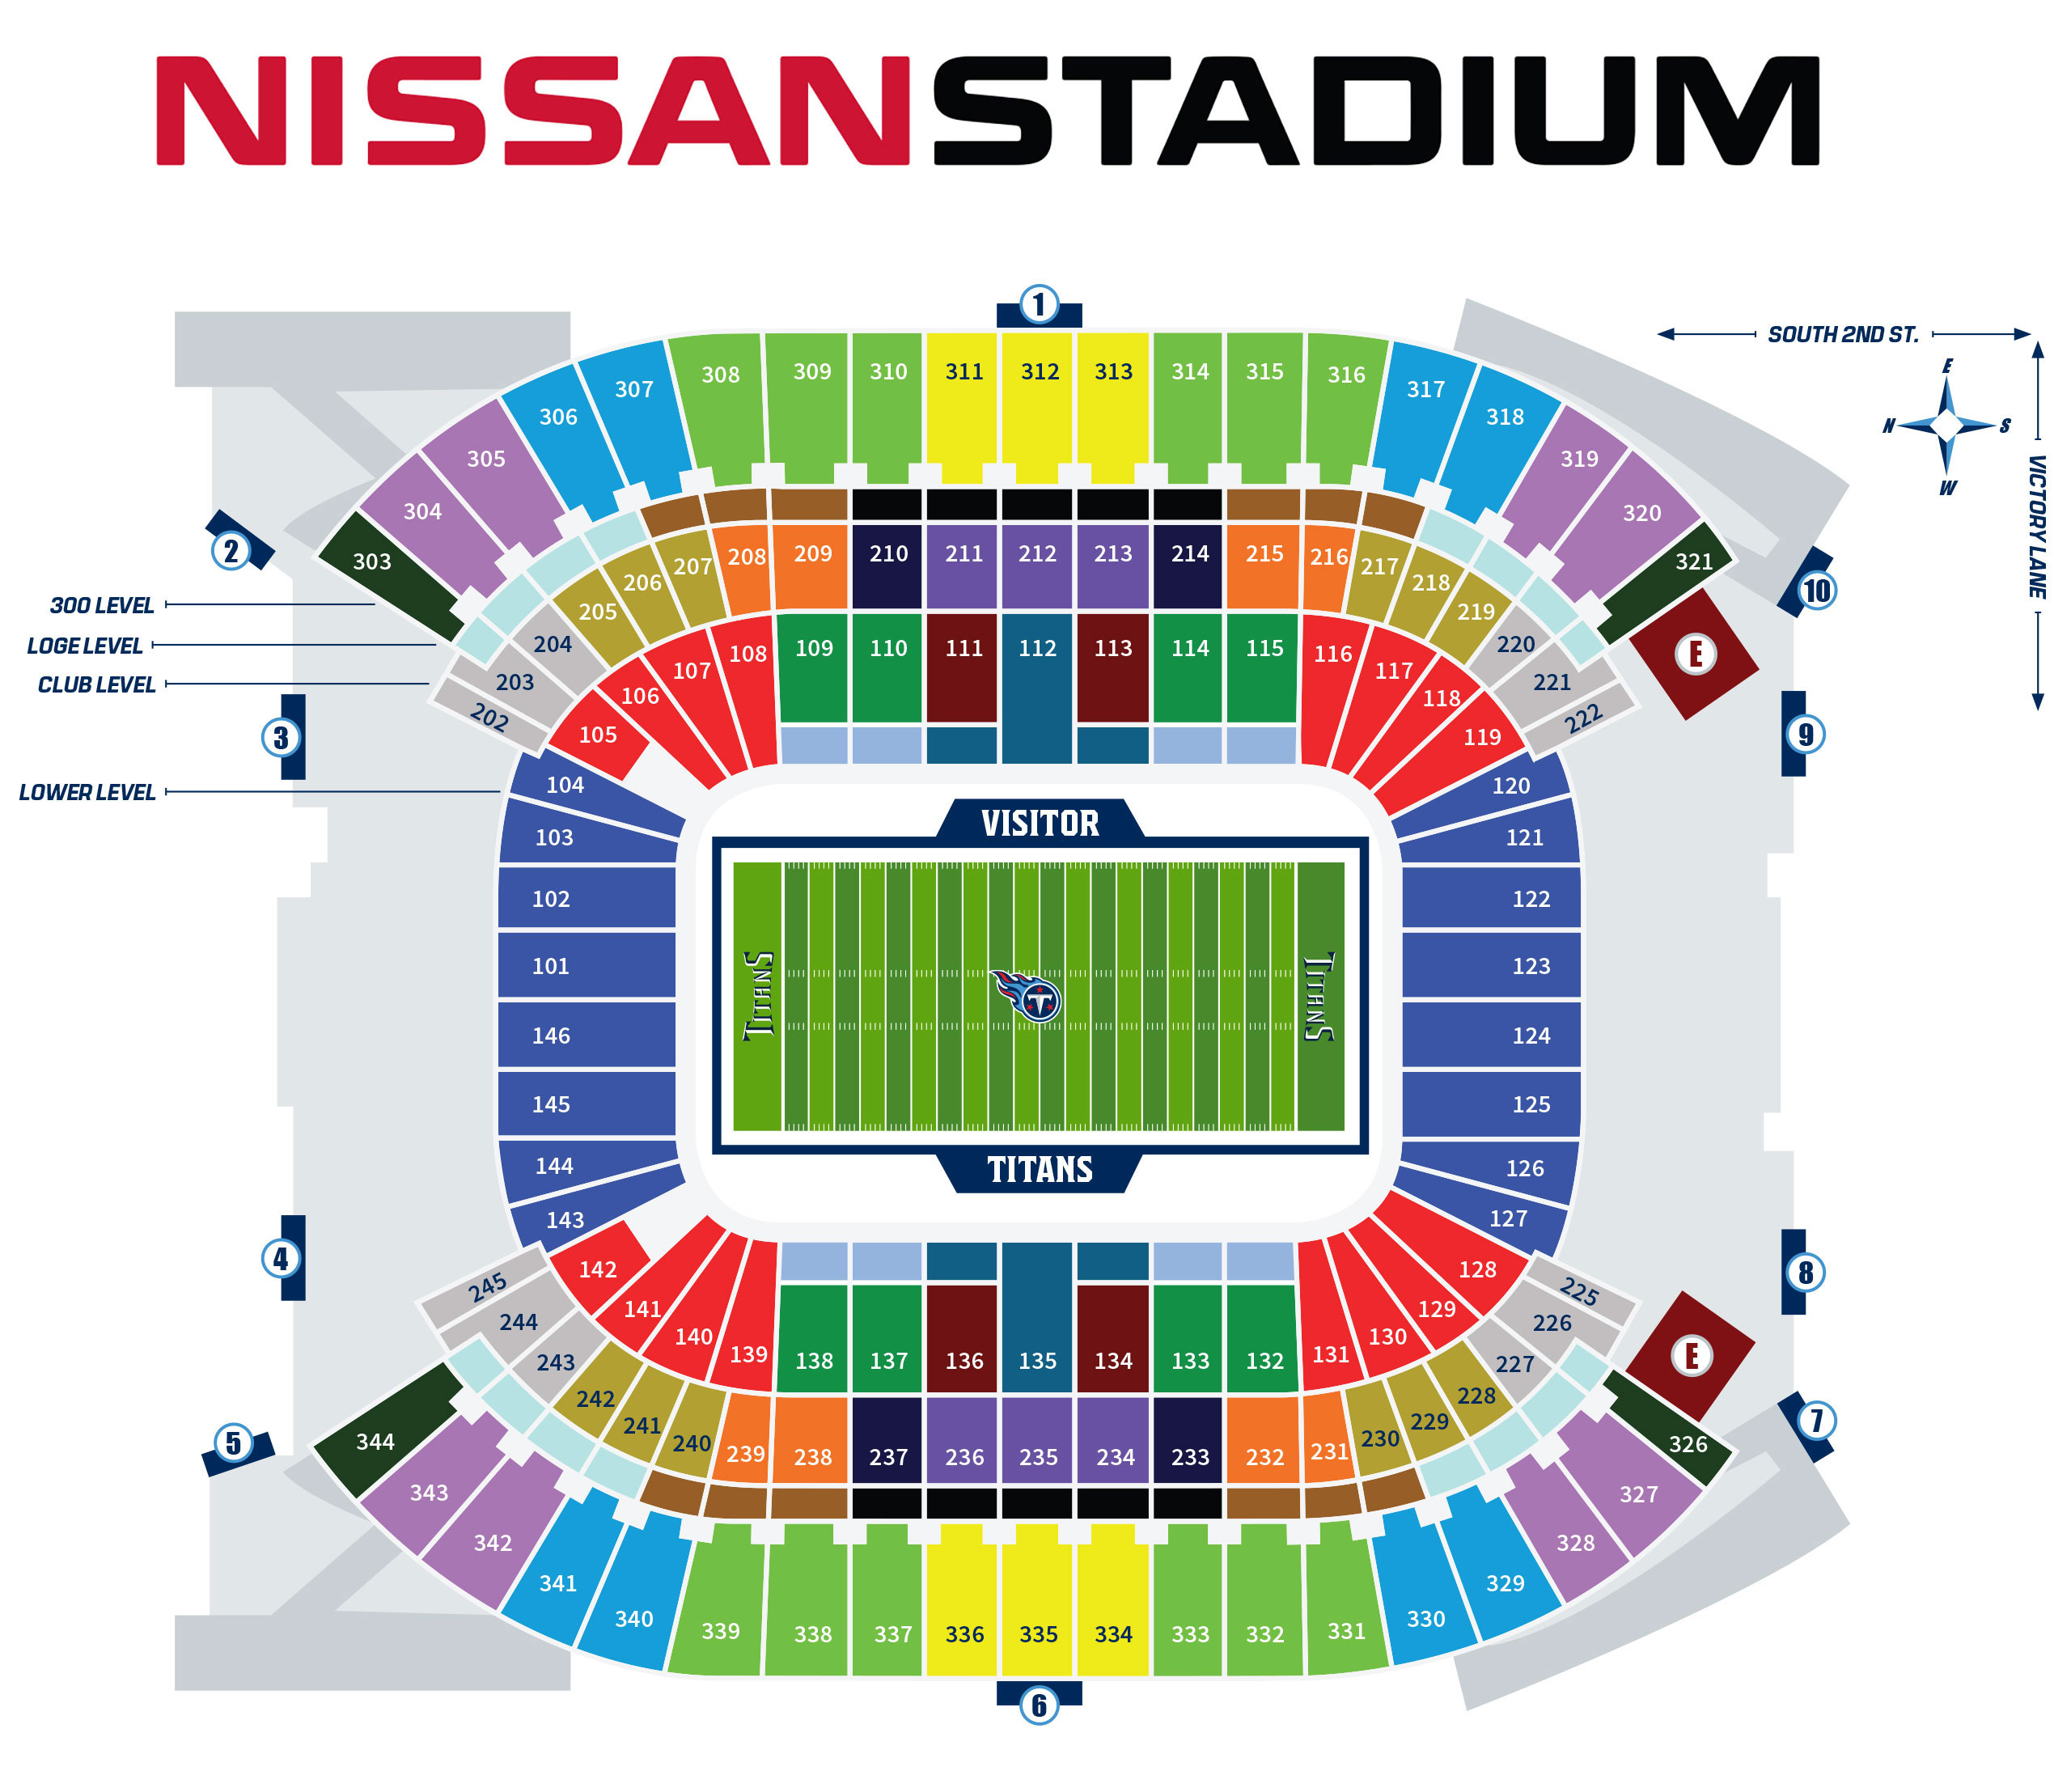 Nissan Stadium Seating Guide